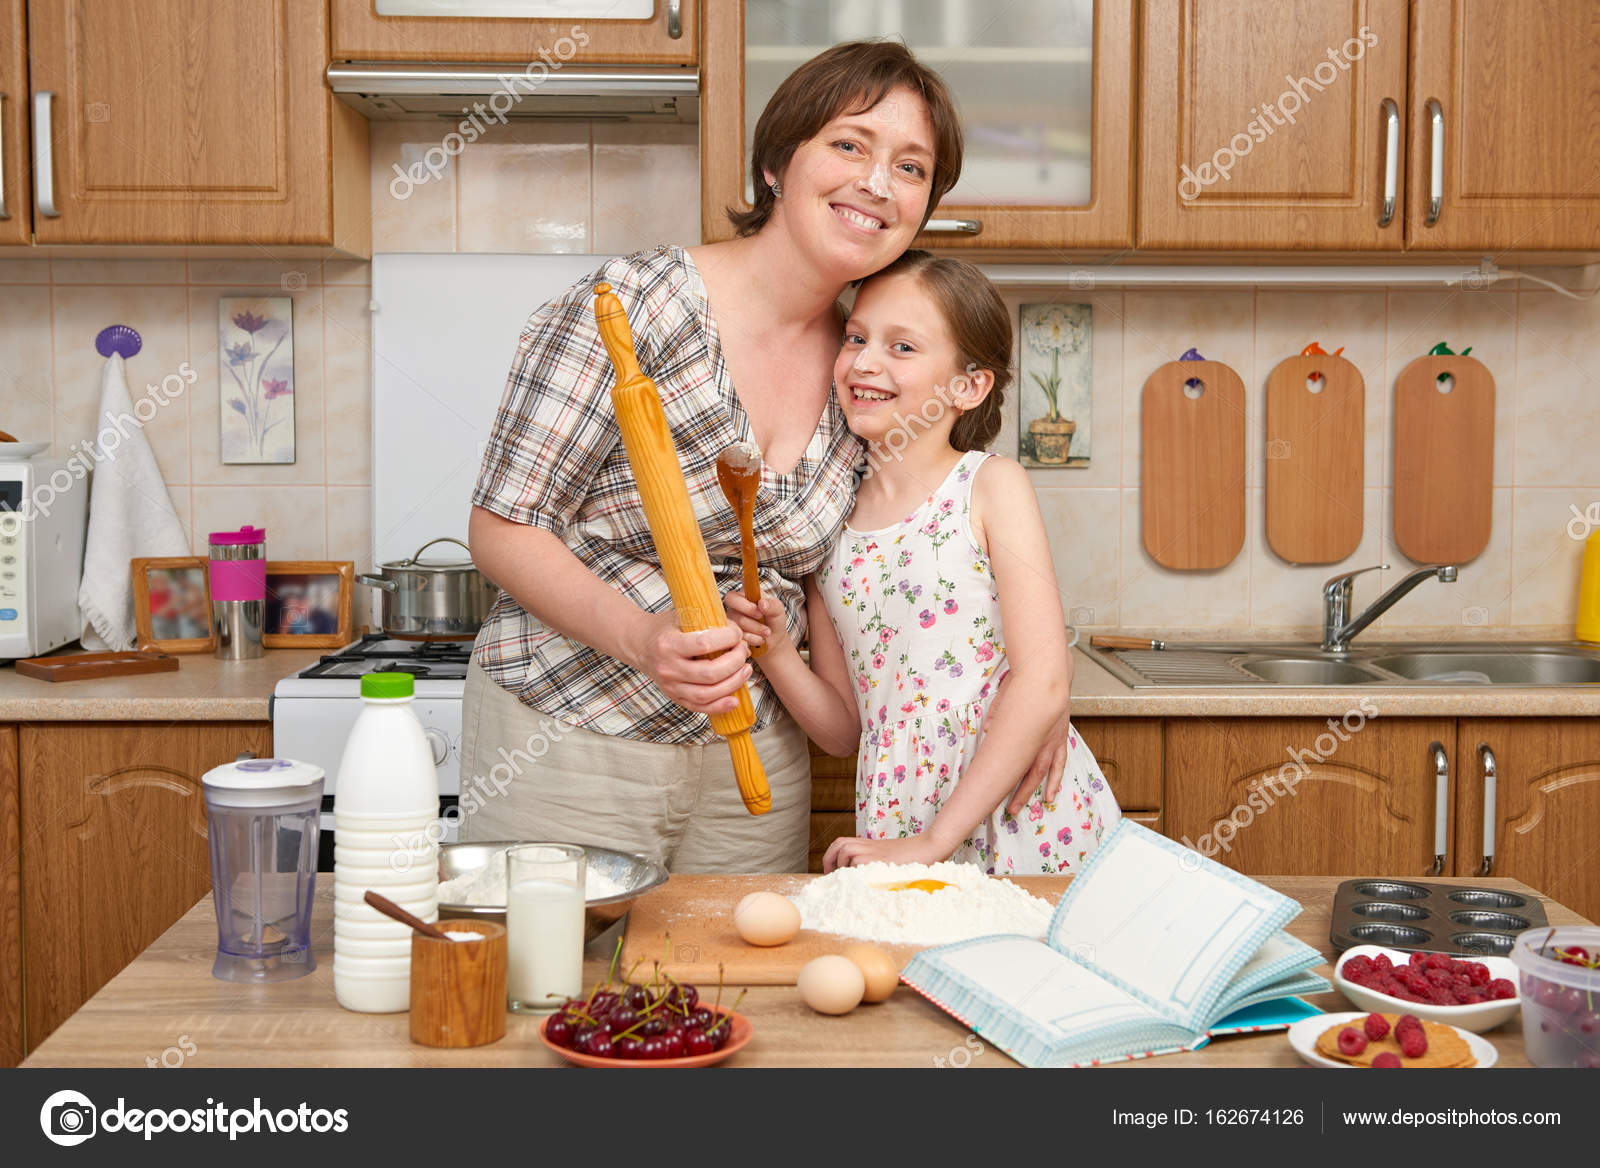 kids wooden kitchen aide dishwasher 女人和孩子的女孩准备烘烤和木制背景上的饼干面粉 生的食物和厨房用具 打破一个鸡蛋 烹饪面团 照片作者soleg